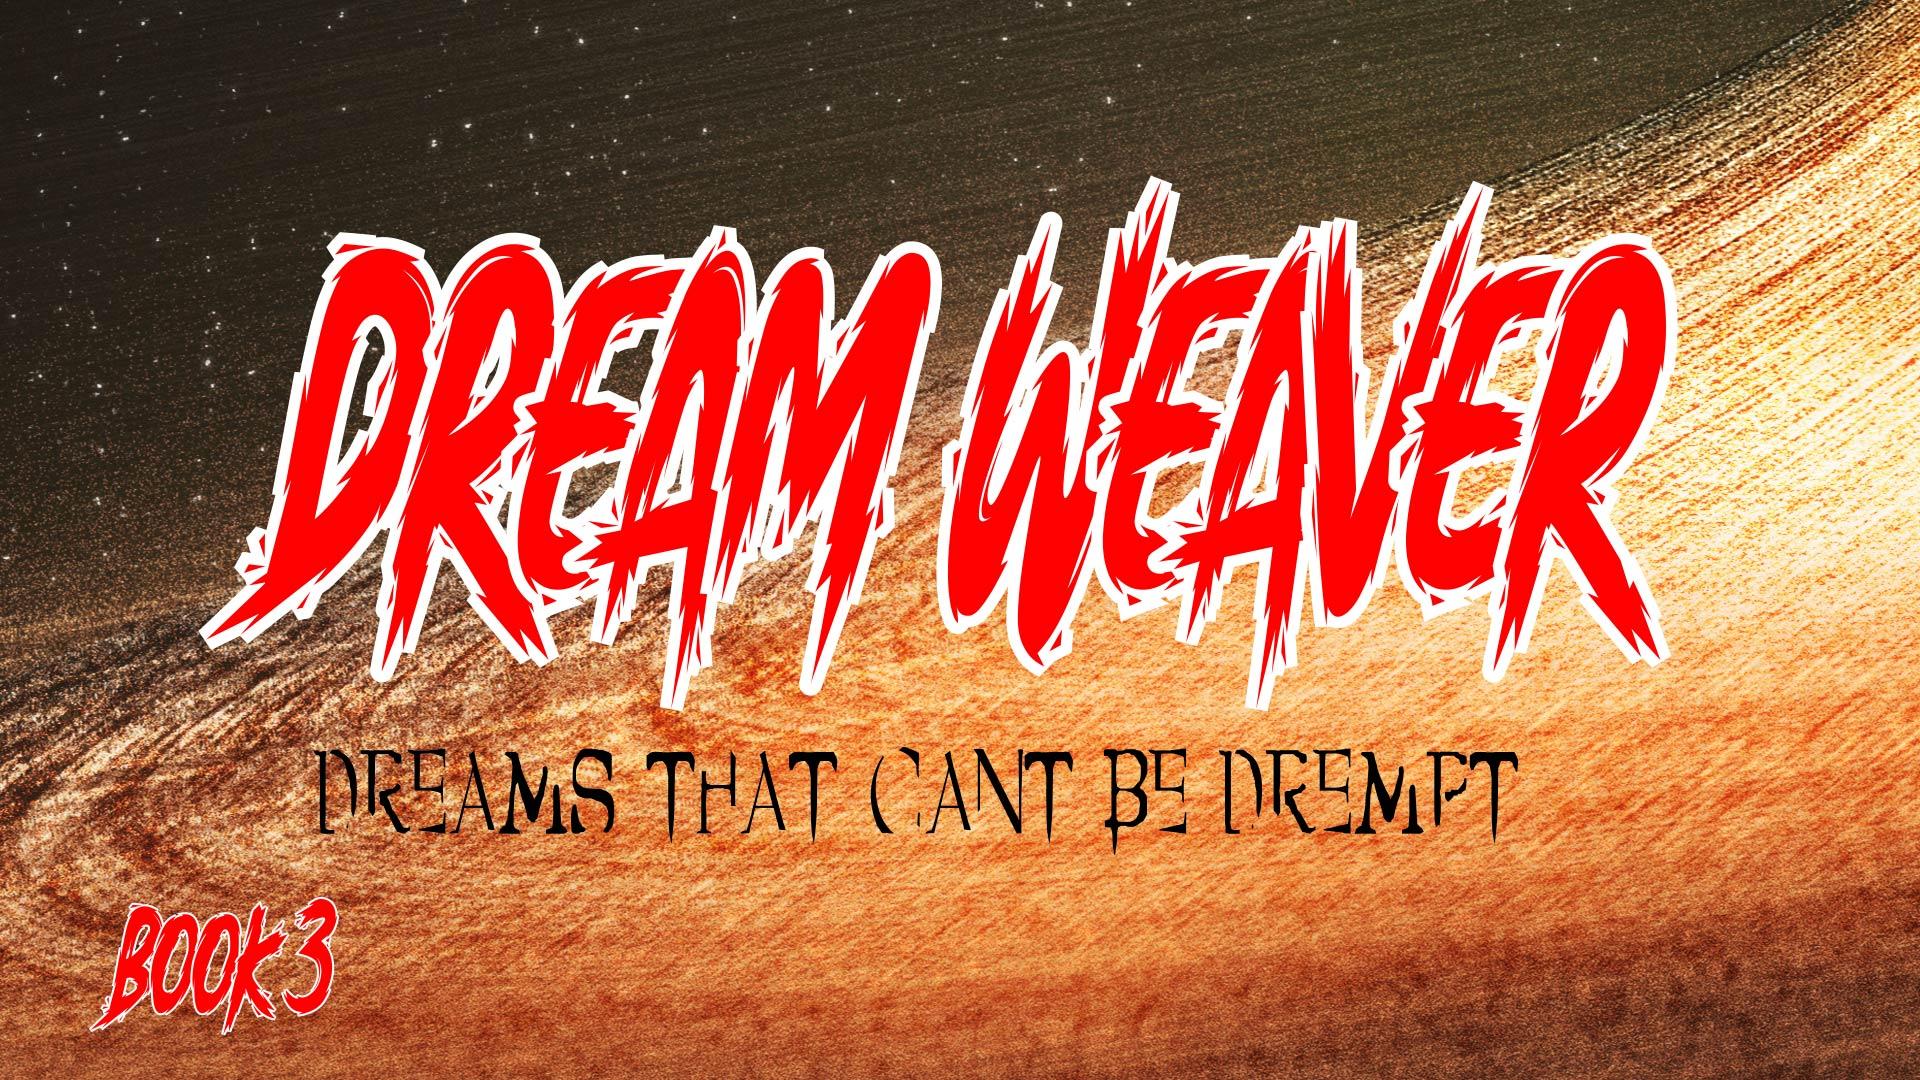 Dream Weaver Digital Comic - Book 3